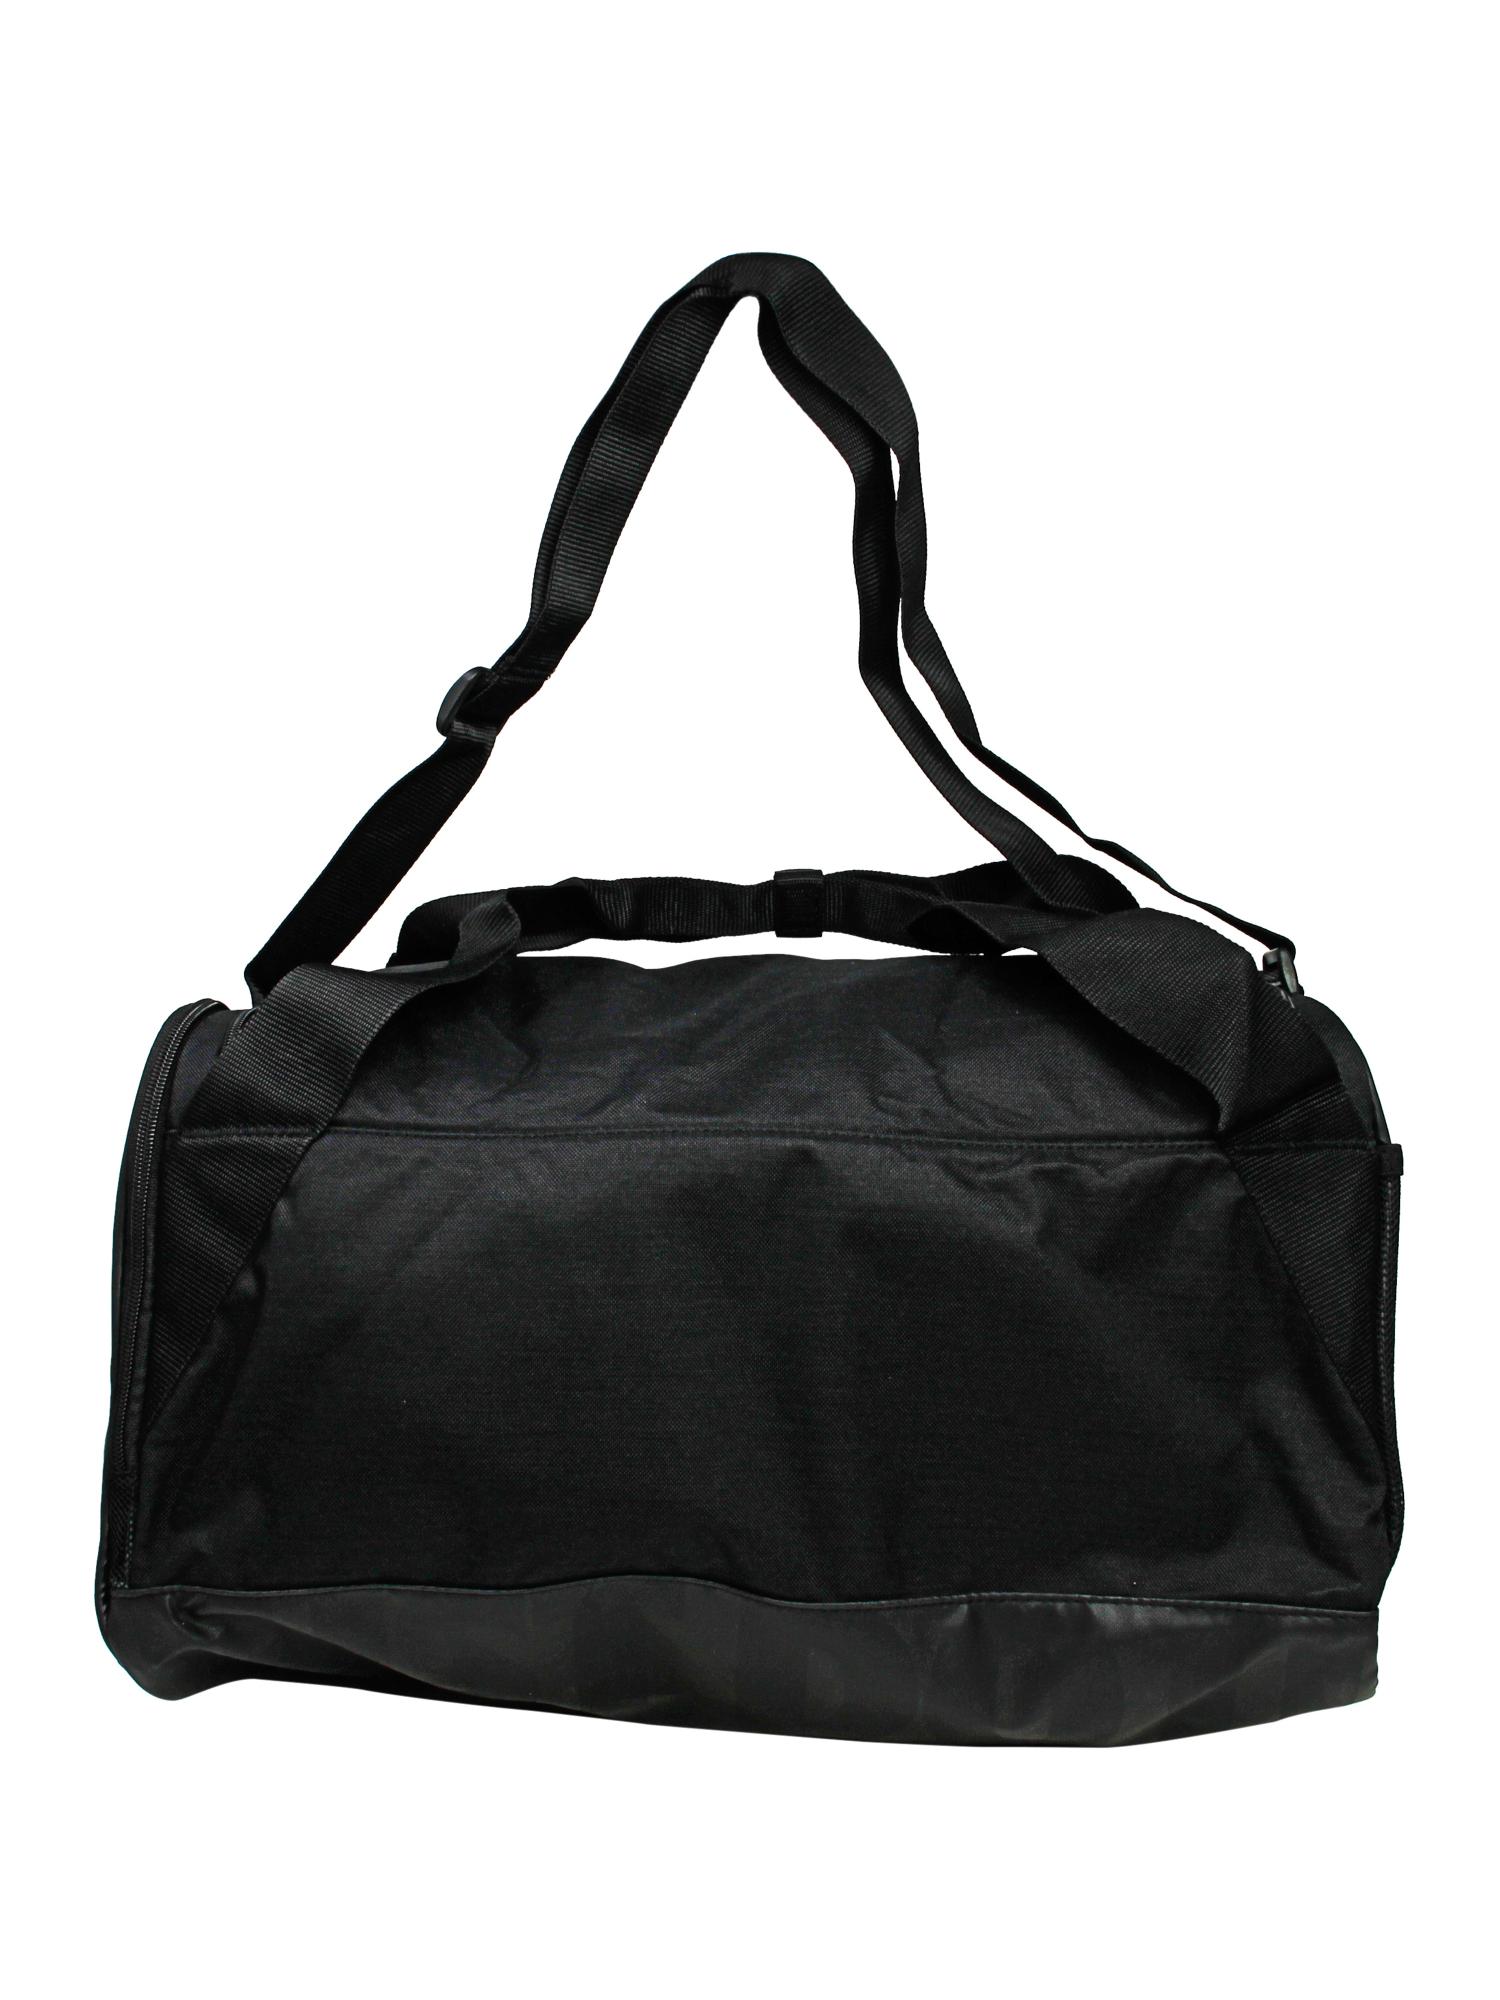 6397172b31b8 Nike-Brasilia-Small-Duffel-Polyester-Duffle-Bag-Hobo thumbnail